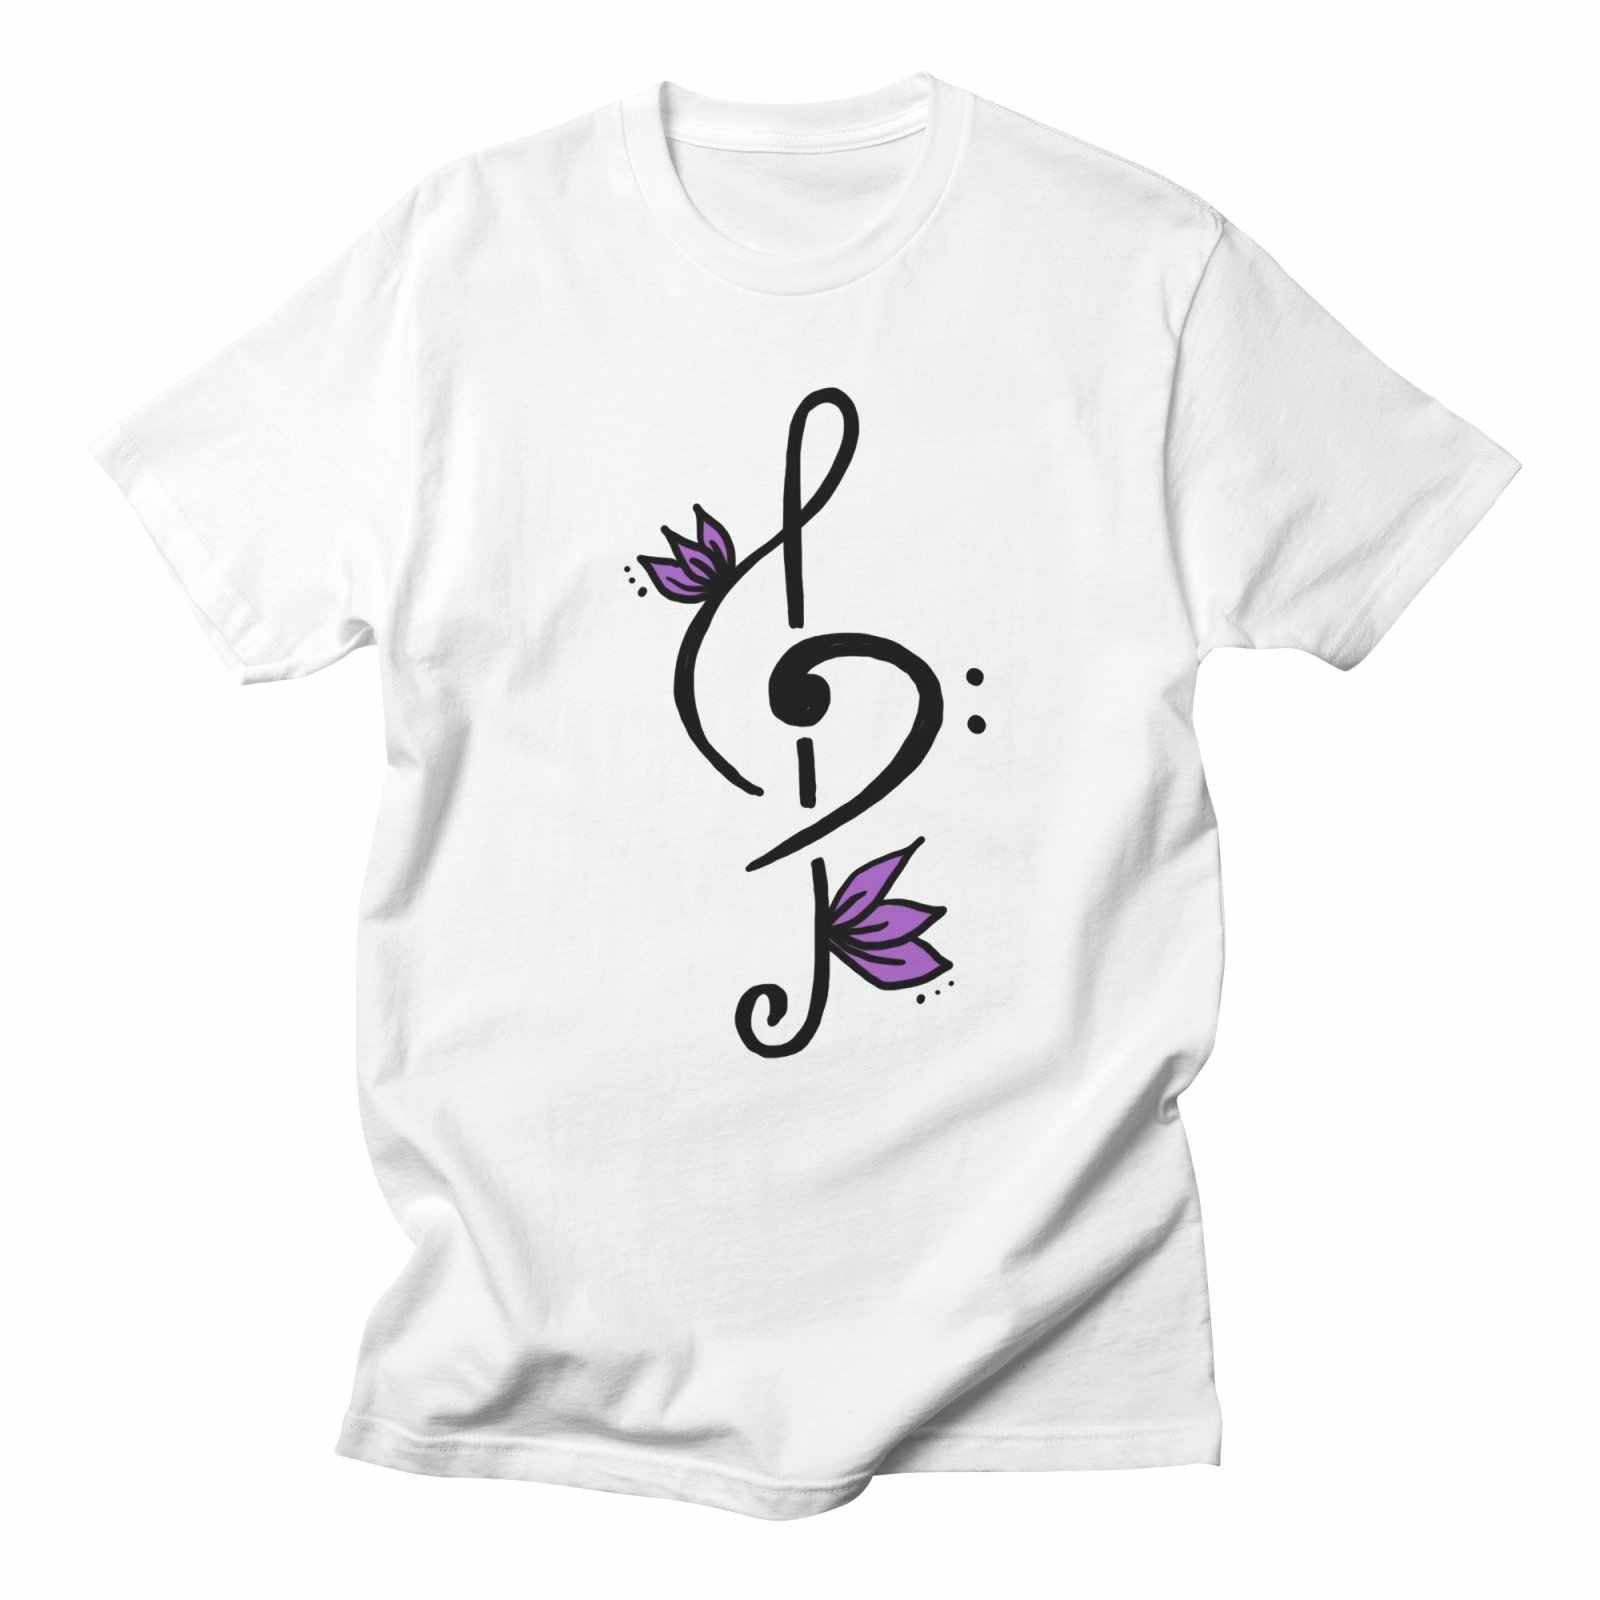 Music Tshirts Cotton Women Rock And Roll High Quality Streetwear Harajuku Fashion Summer Style Casual O Neck Tee Shirt Femme 3xl